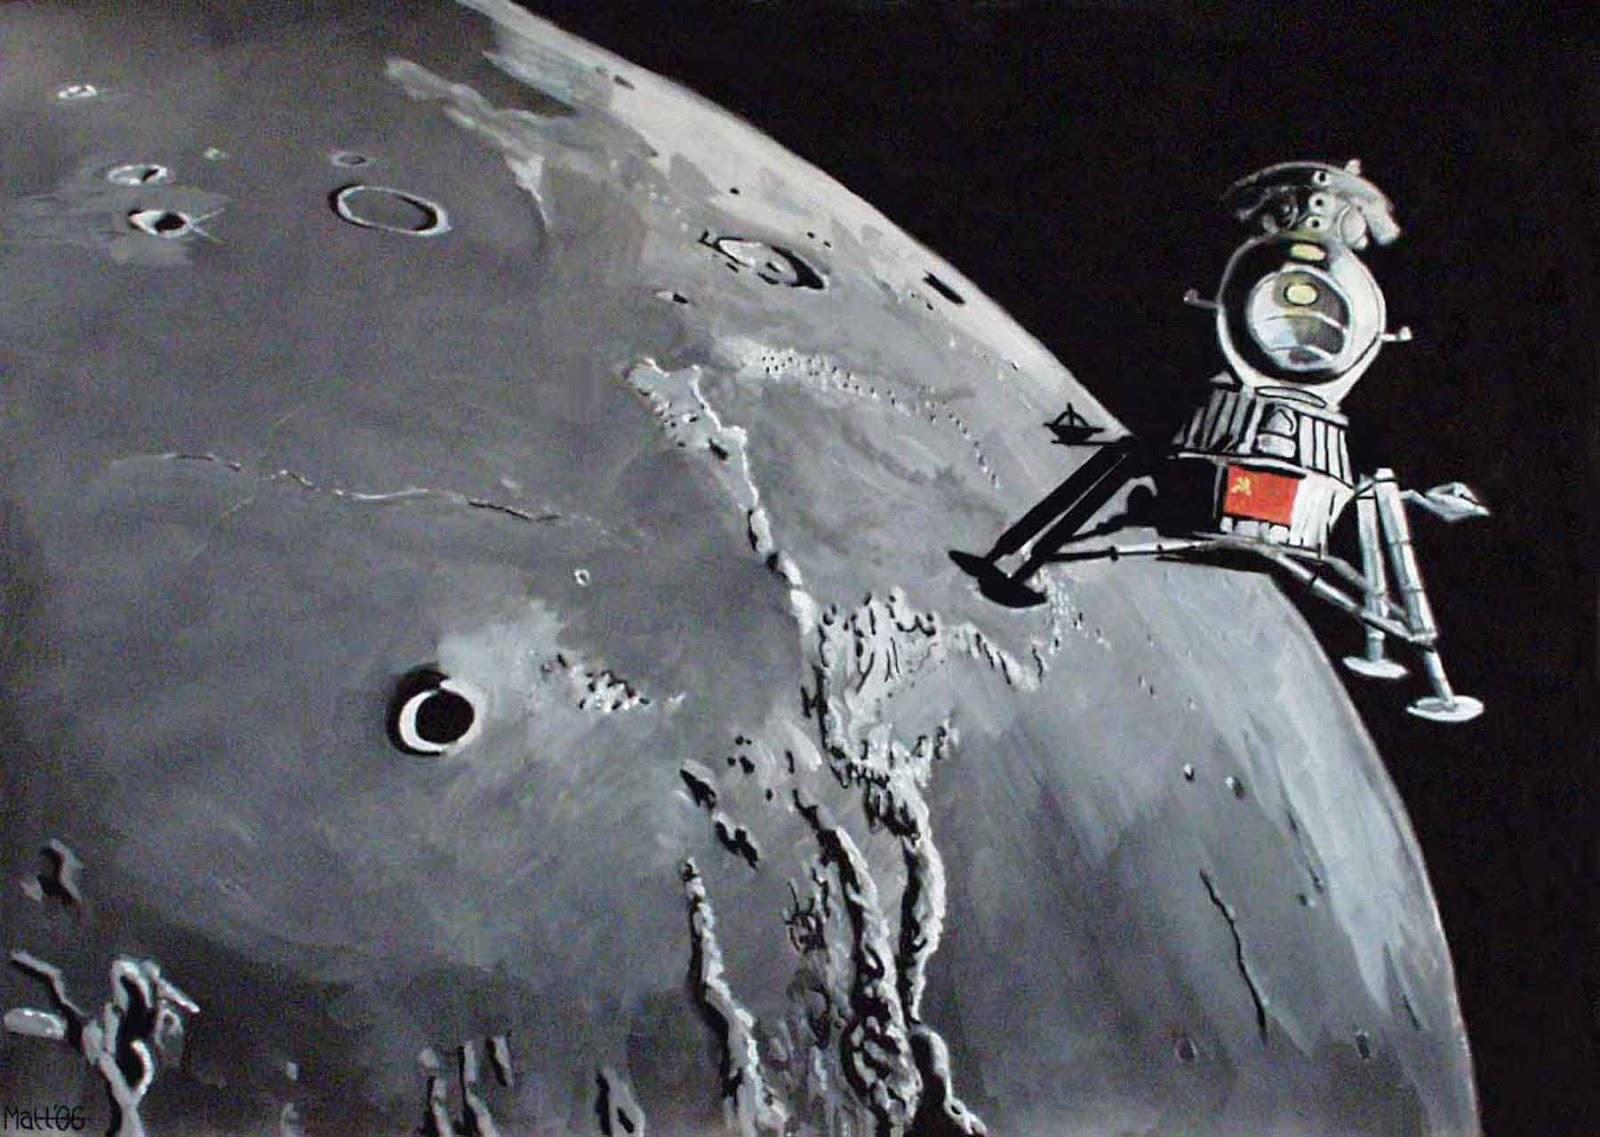 soviets moon landing rockets - photo #38